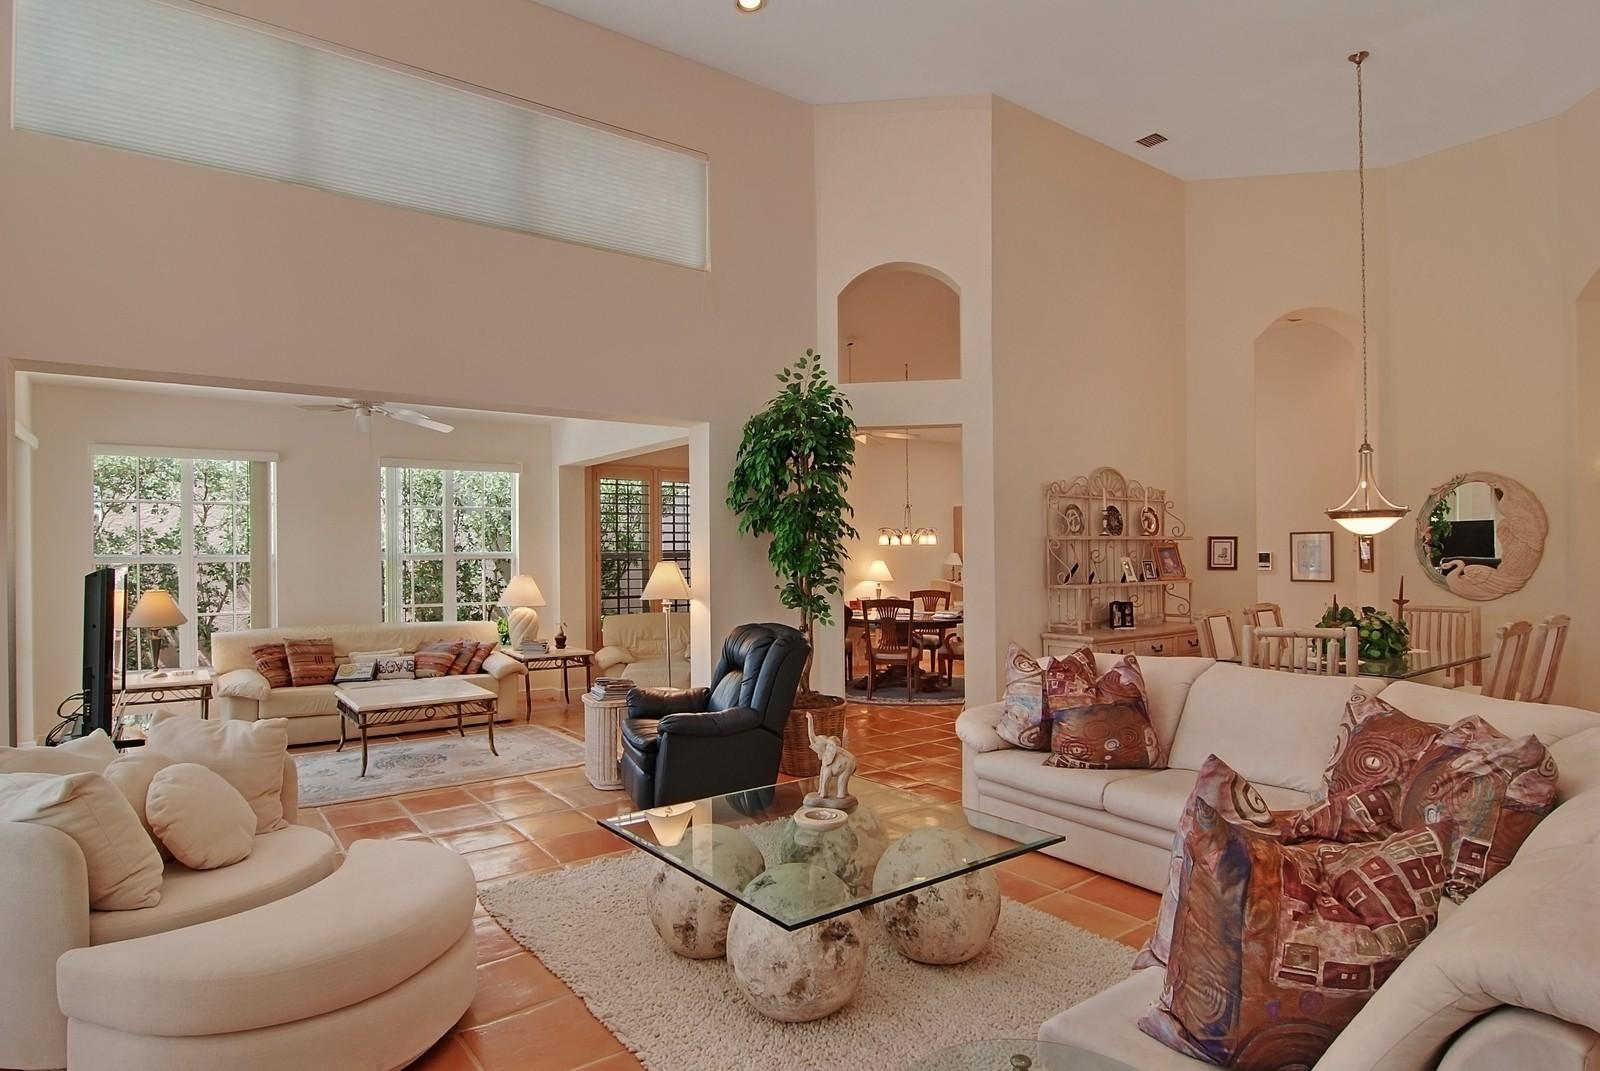 Real Estate Photography - 7000 SE Lakeview, Stuart, FL, 34996 - Living Room / Dining Room